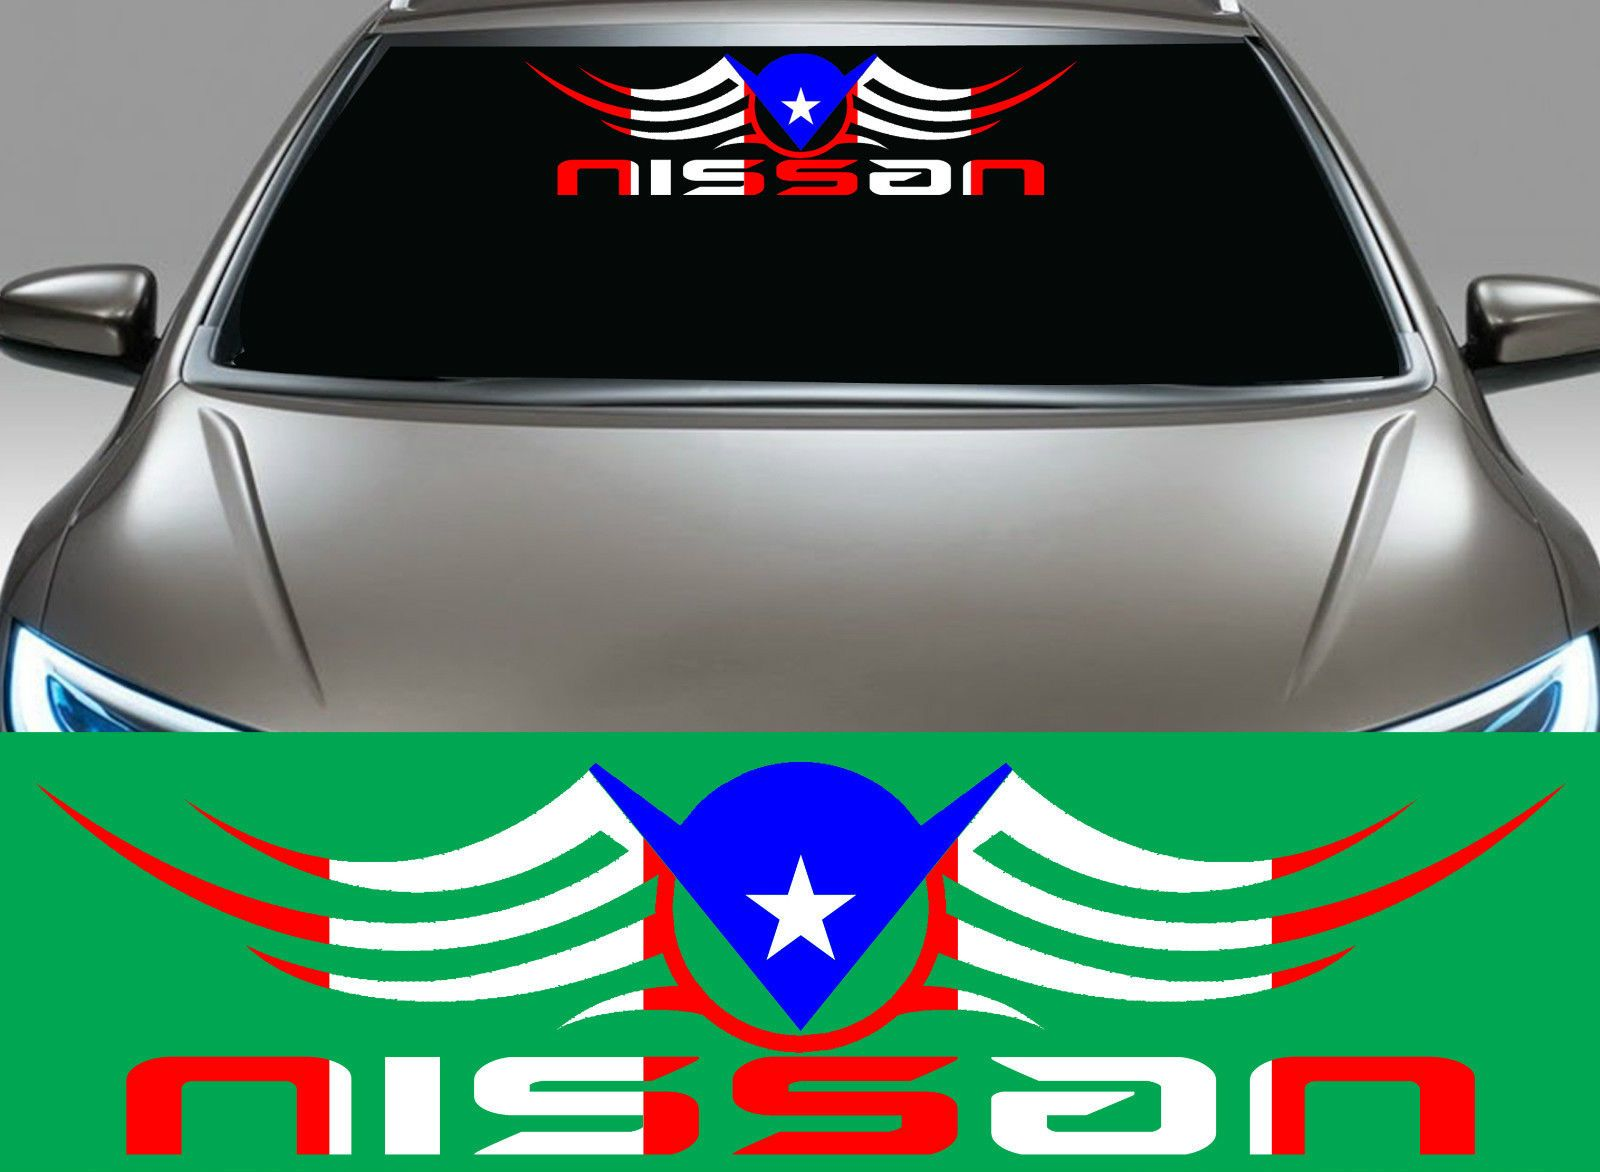 Car sticker design ebay - 1 Puerto Rico Puerto Rican Flag Car Decal Vinyl Stickers 5379 Ebay